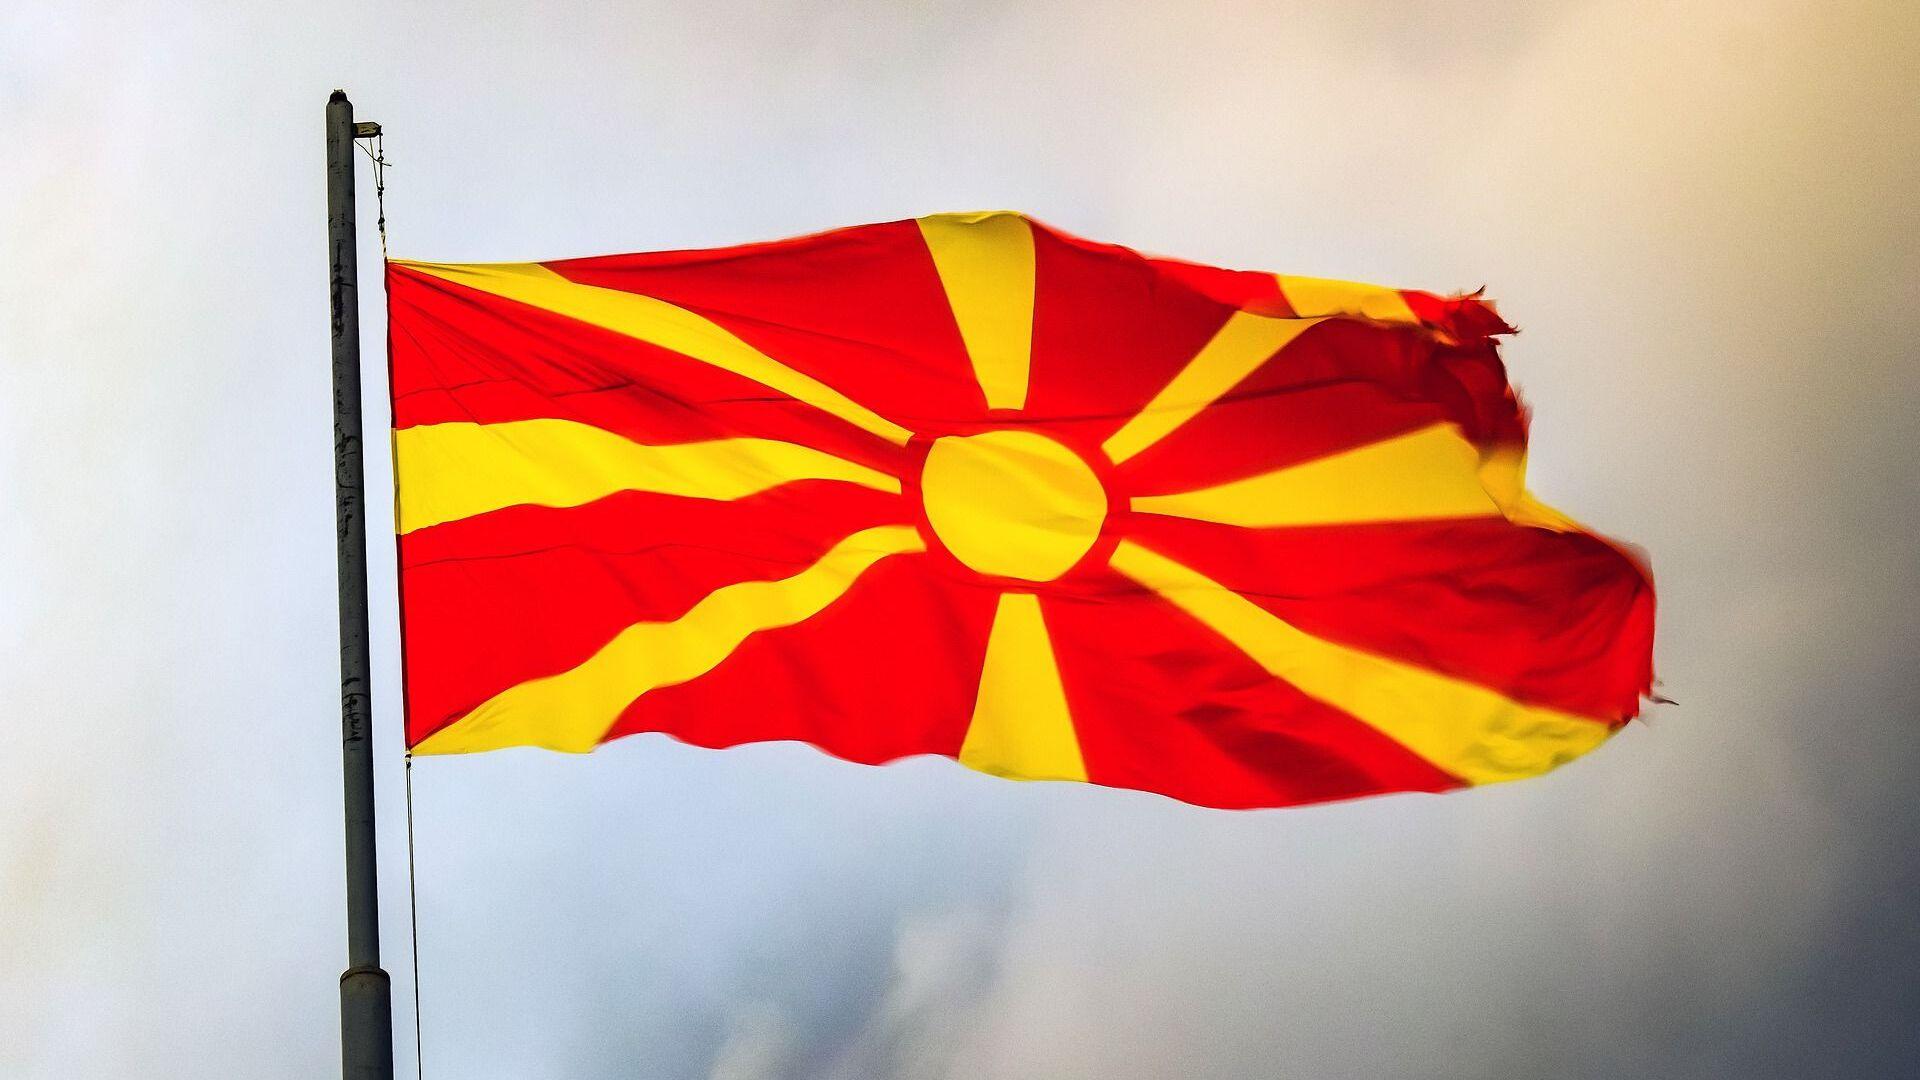 Bandera de Macedonia del Norte - Sputnik Mundo, 1920, 20.05.2021